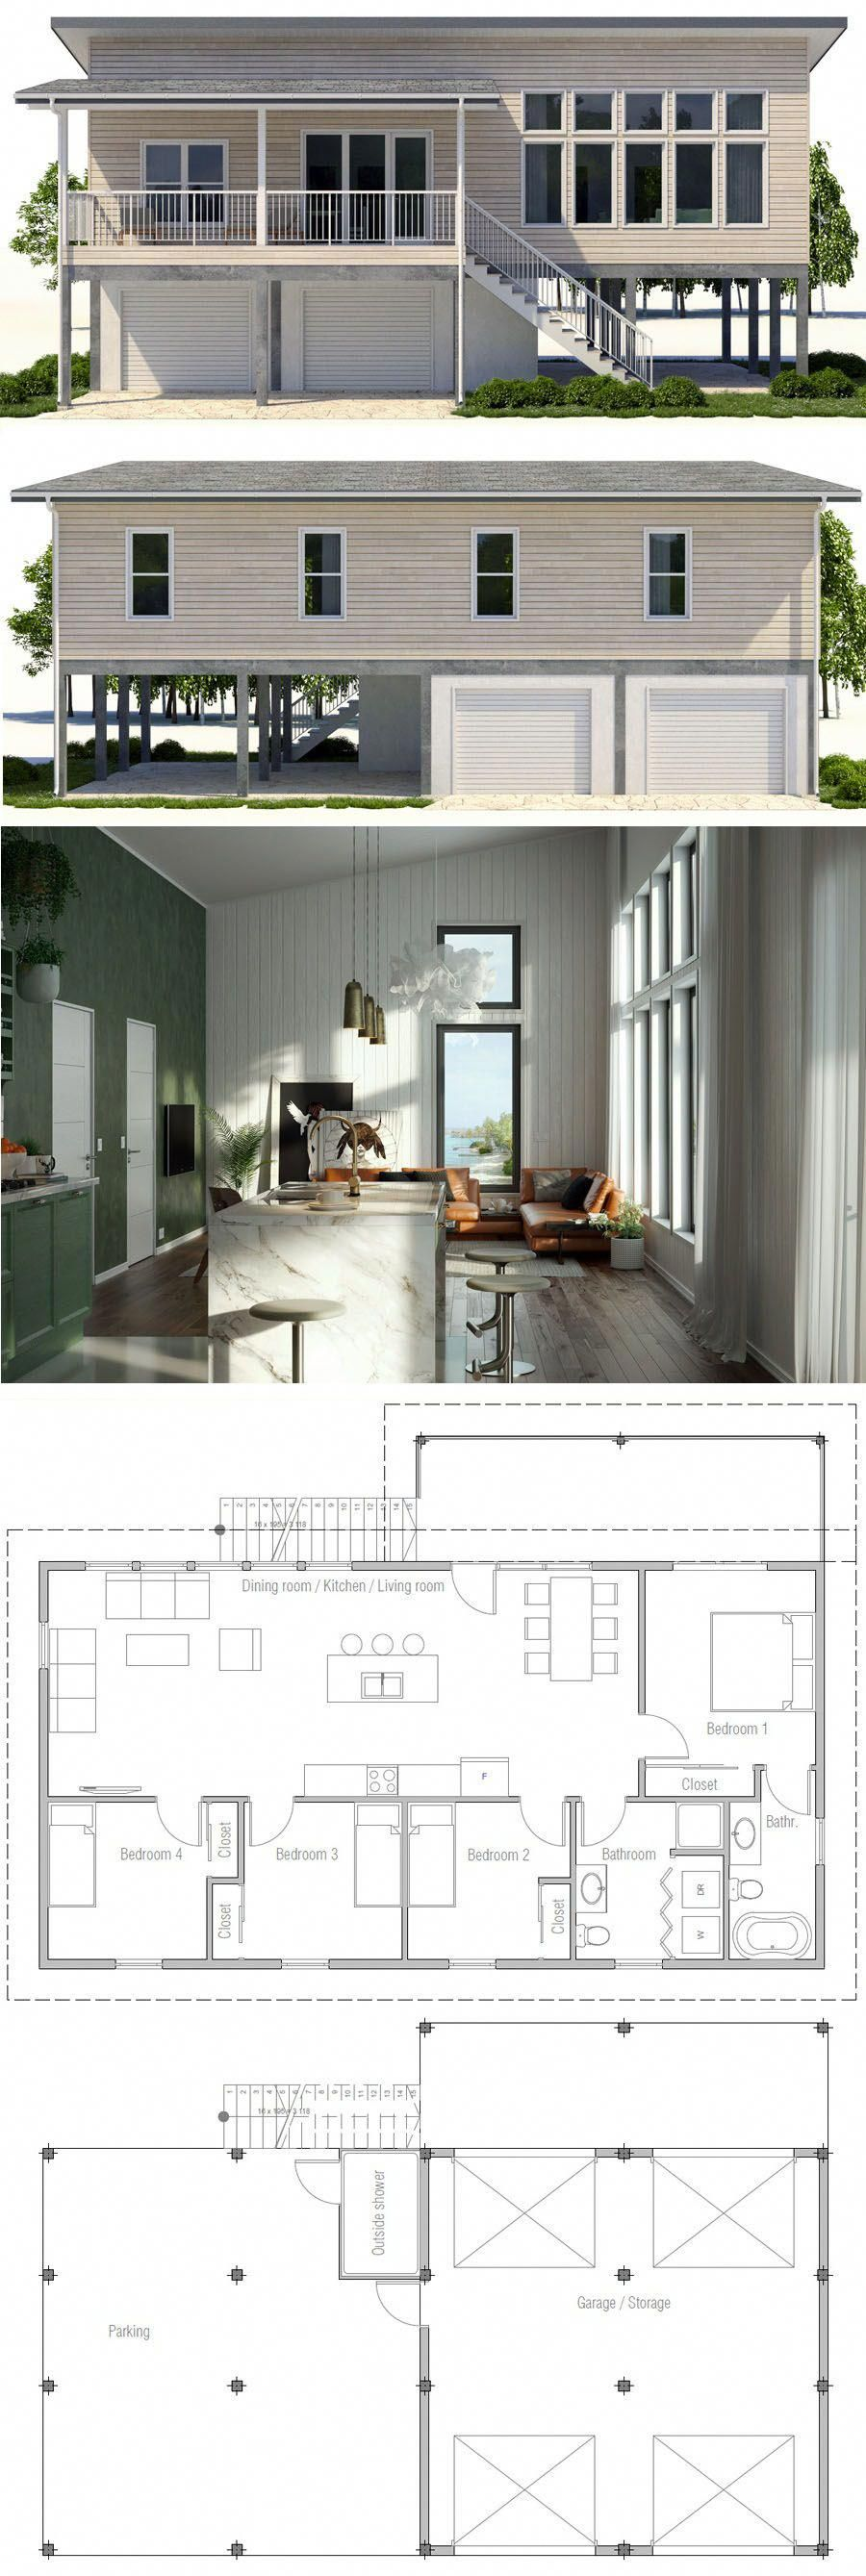 Arquitetura planta de casa casas plantadecasa casasamericanas beach house plans also rh pinterest